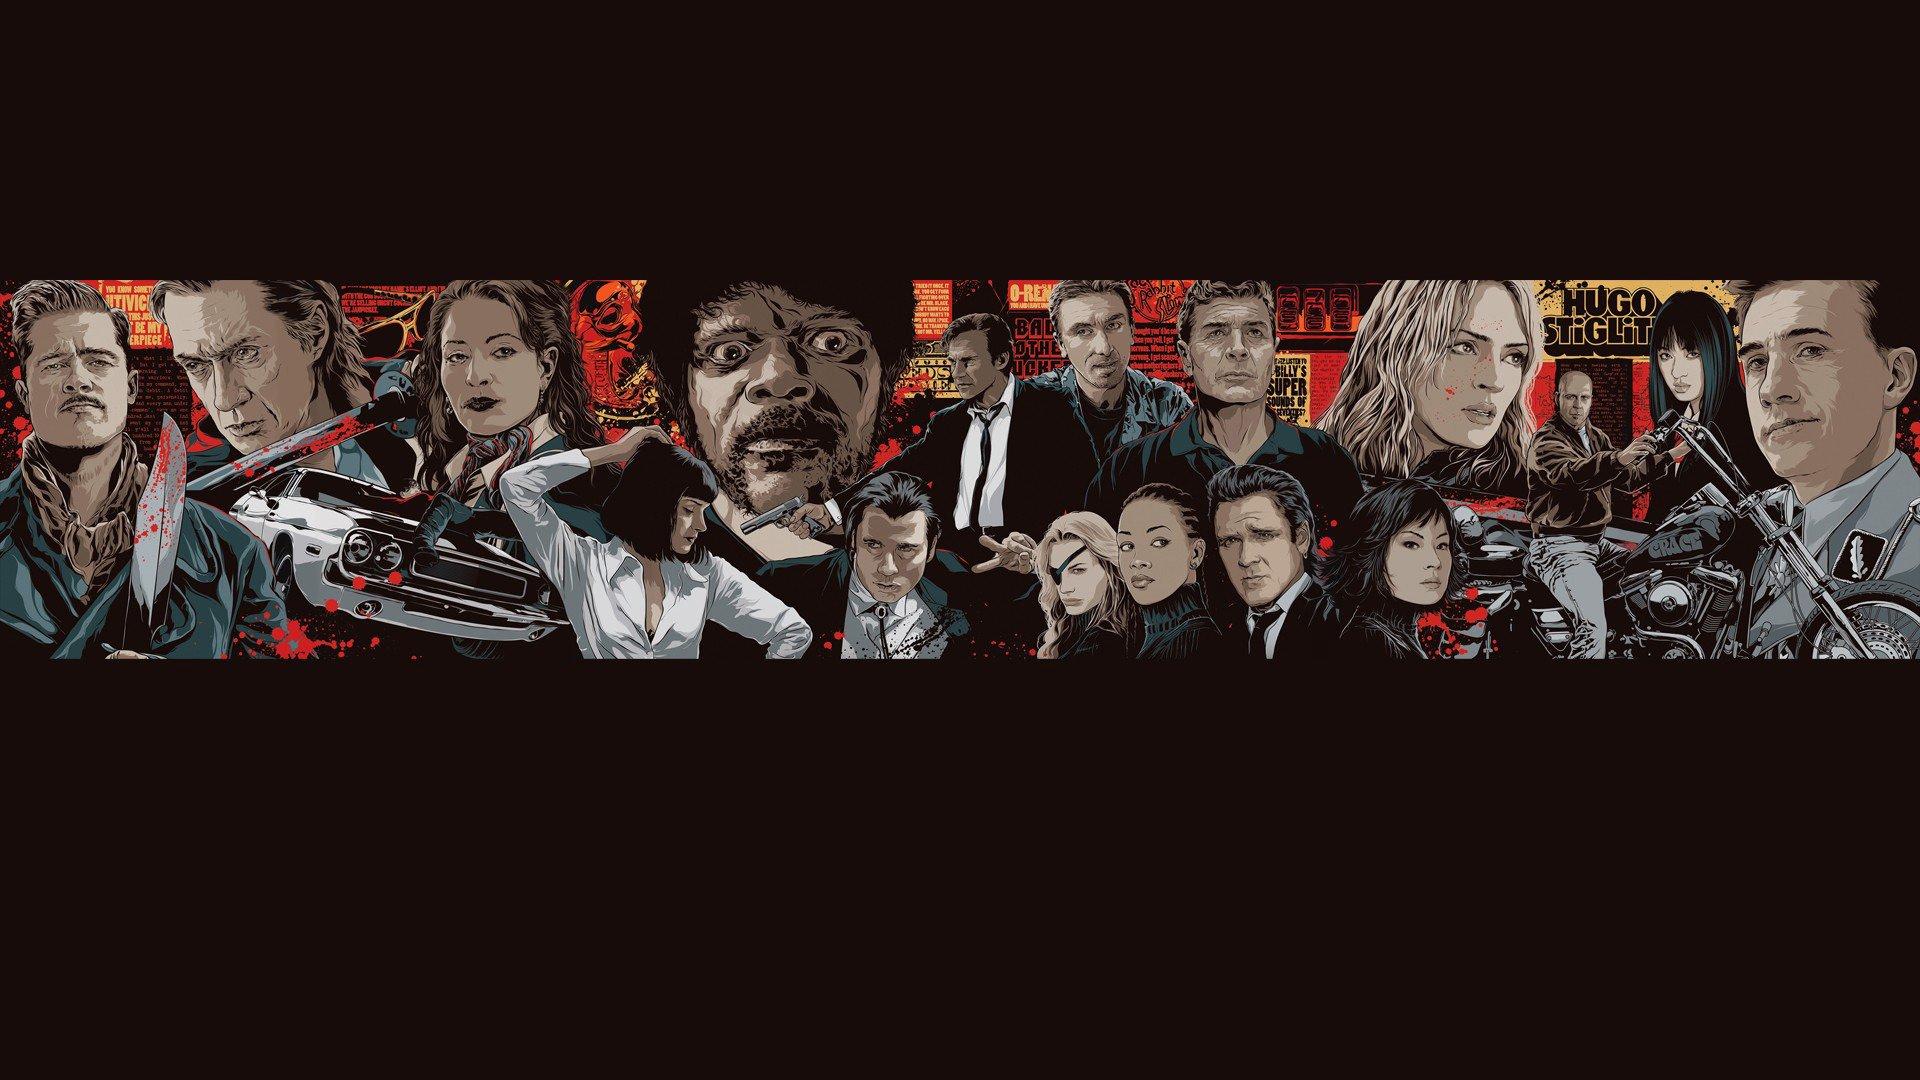 Cheetah Wallpaper Hd Pulp Fiction Wallpapers 26 Wallpapers Adorable Wallpapers